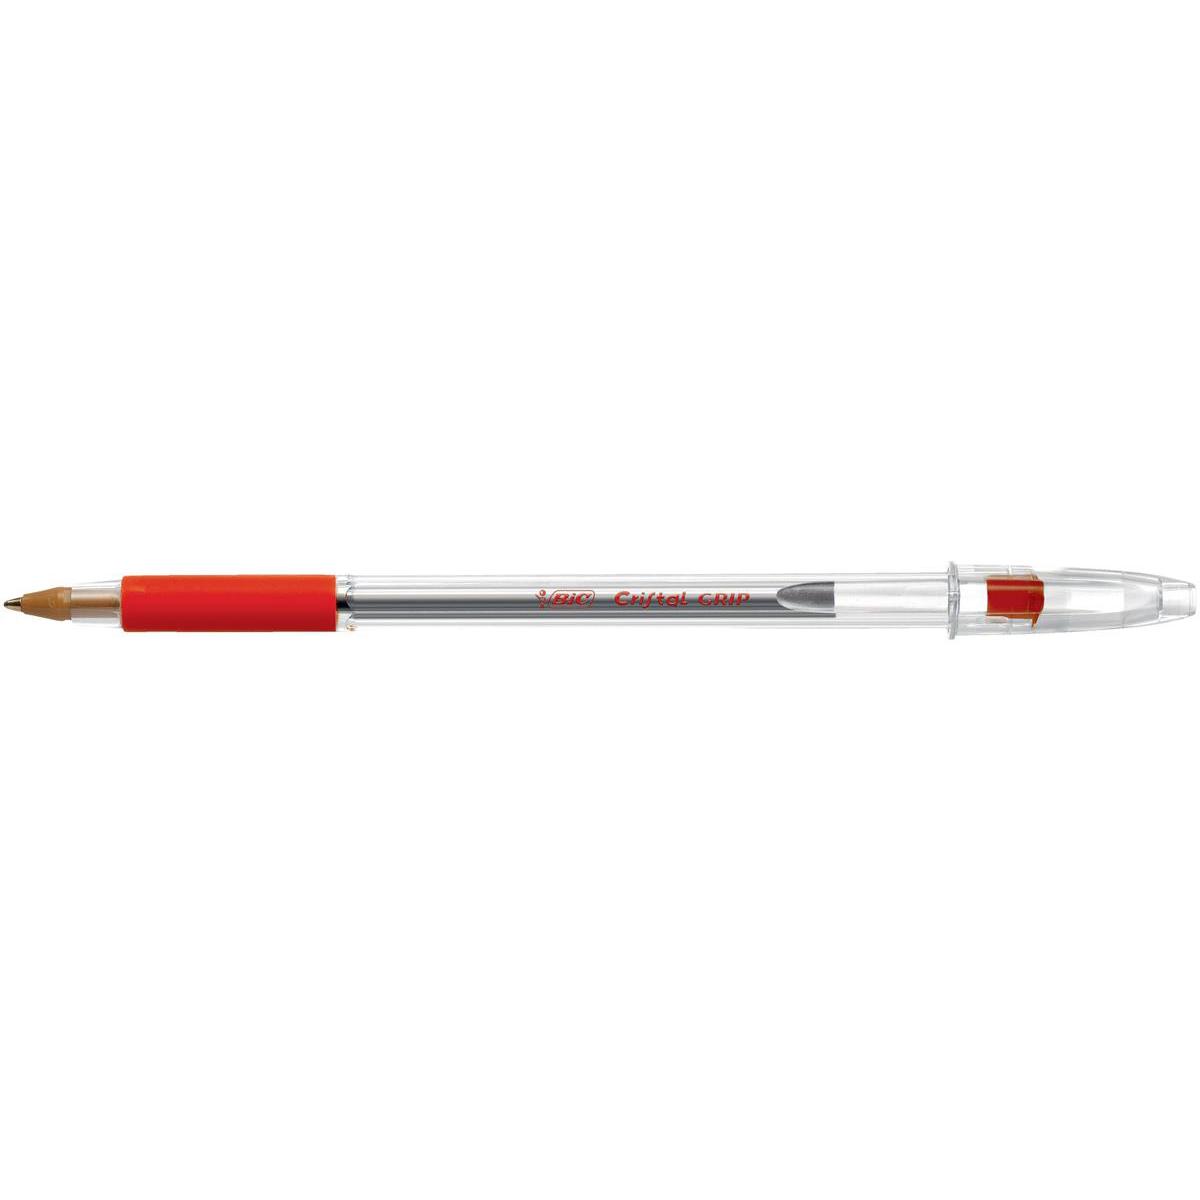 Bic Cristal Grip Ball Pen Medium Clear Barrel 1.0mm Tip 0.32mm Line Red Ref 802803 Pack 20